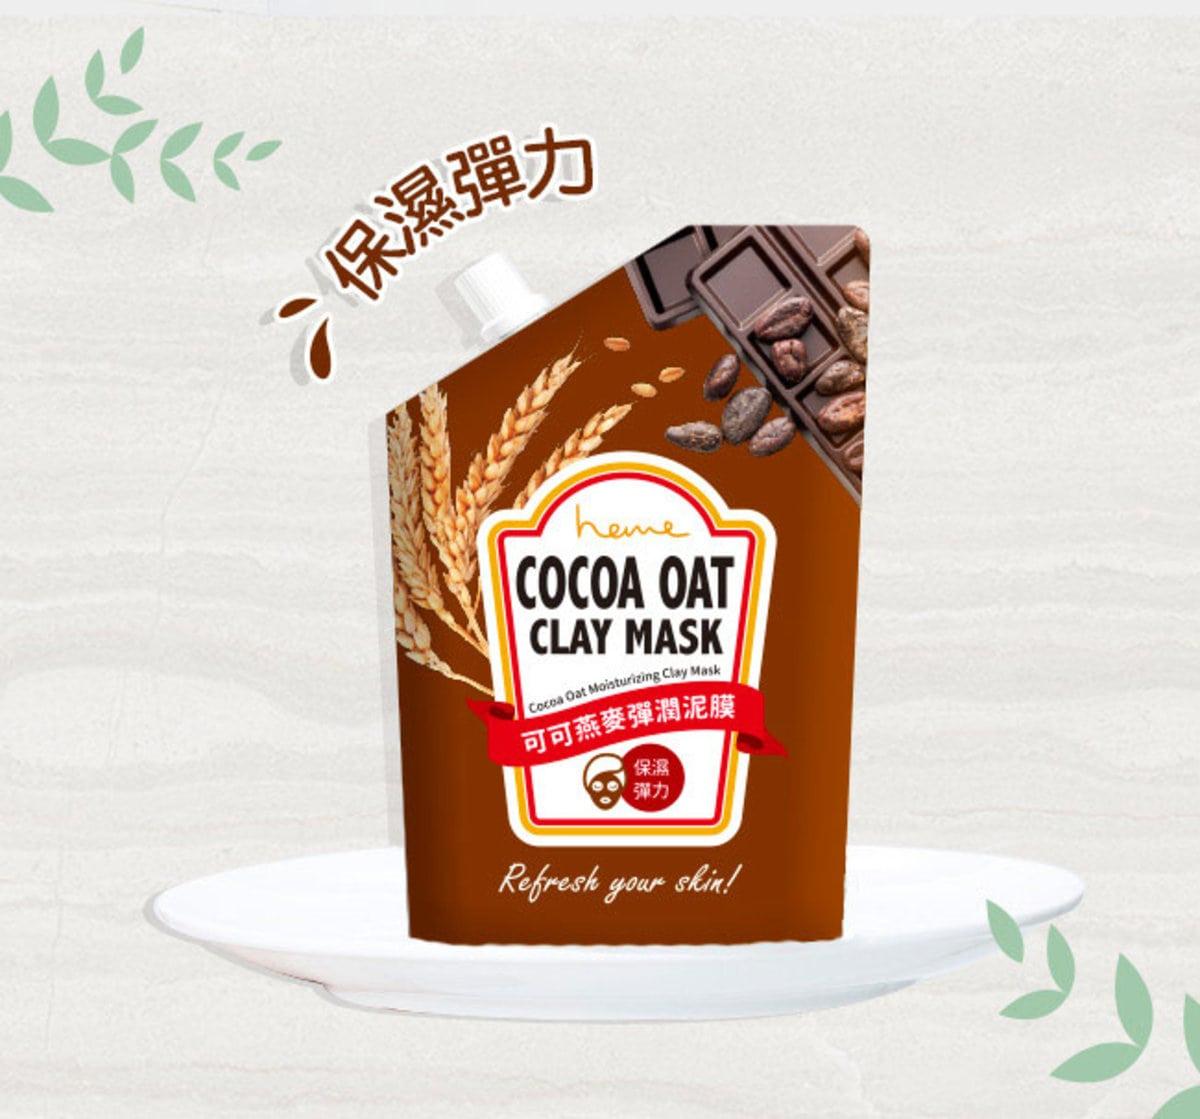 Cocoa Oat Moisturizing Clay Mask - Feature 3